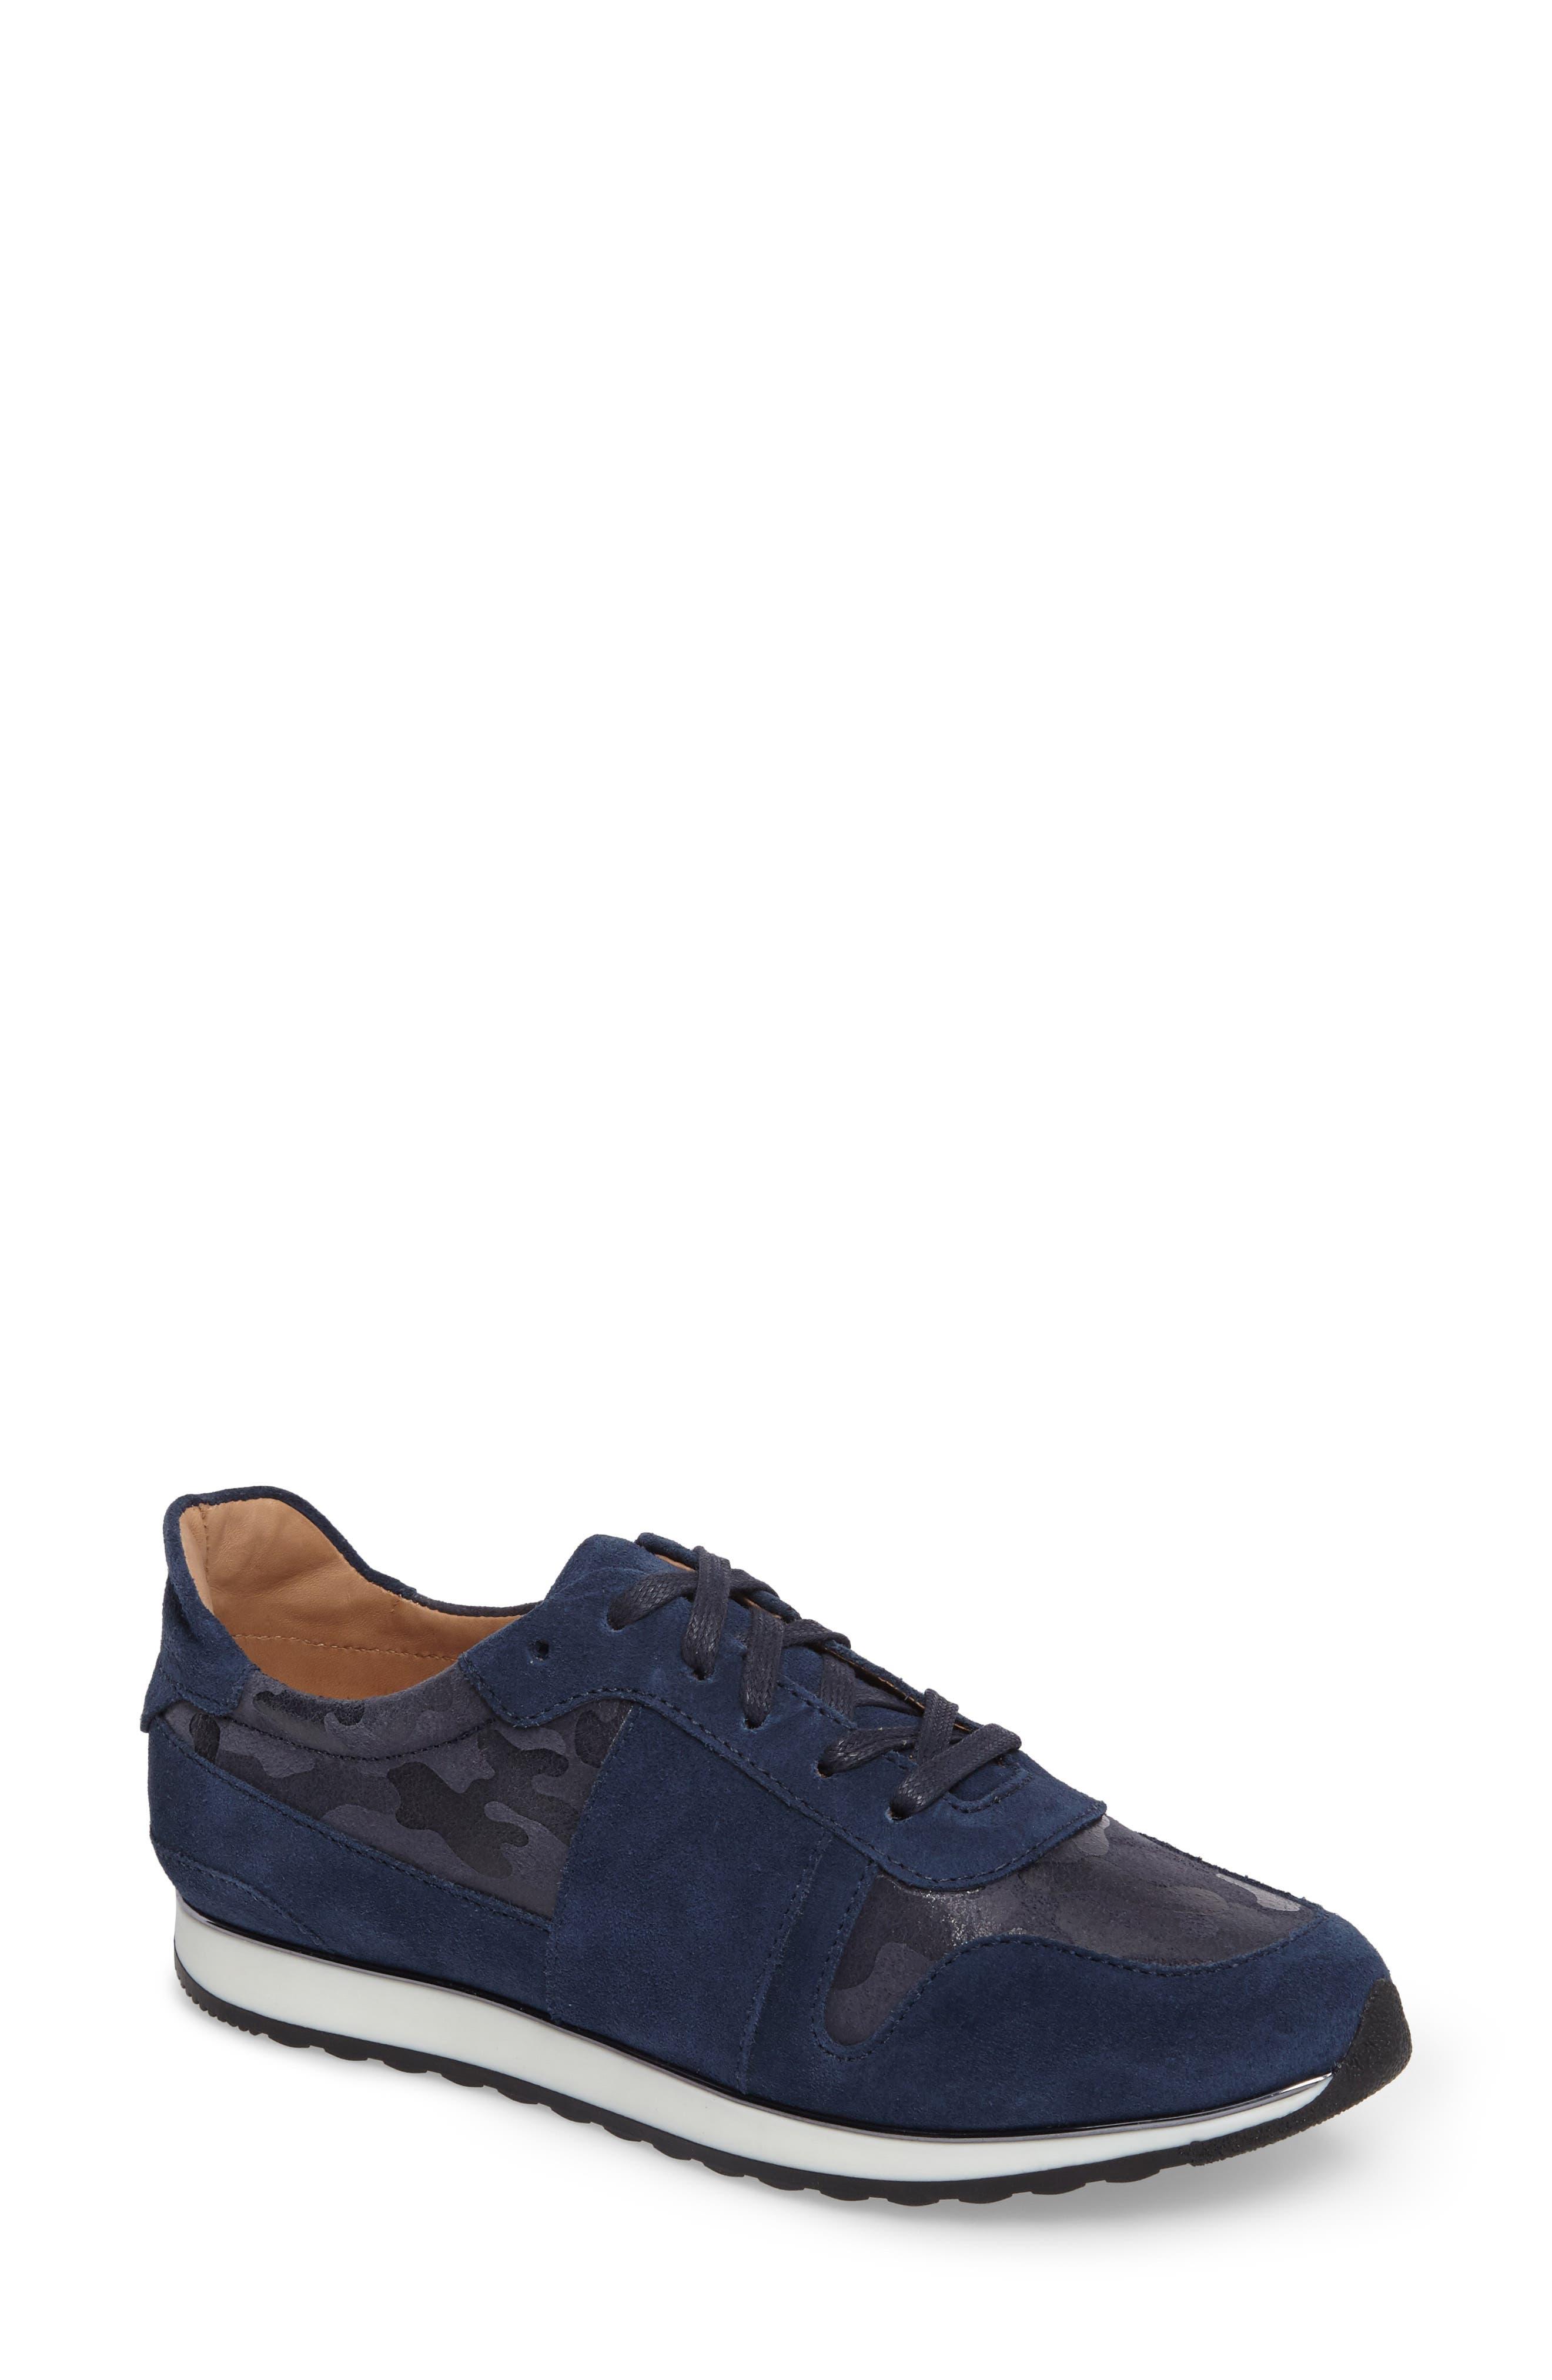 Stefani Sneaker,                             Main thumbnail 1, color,                             Camo Nubuck Leather